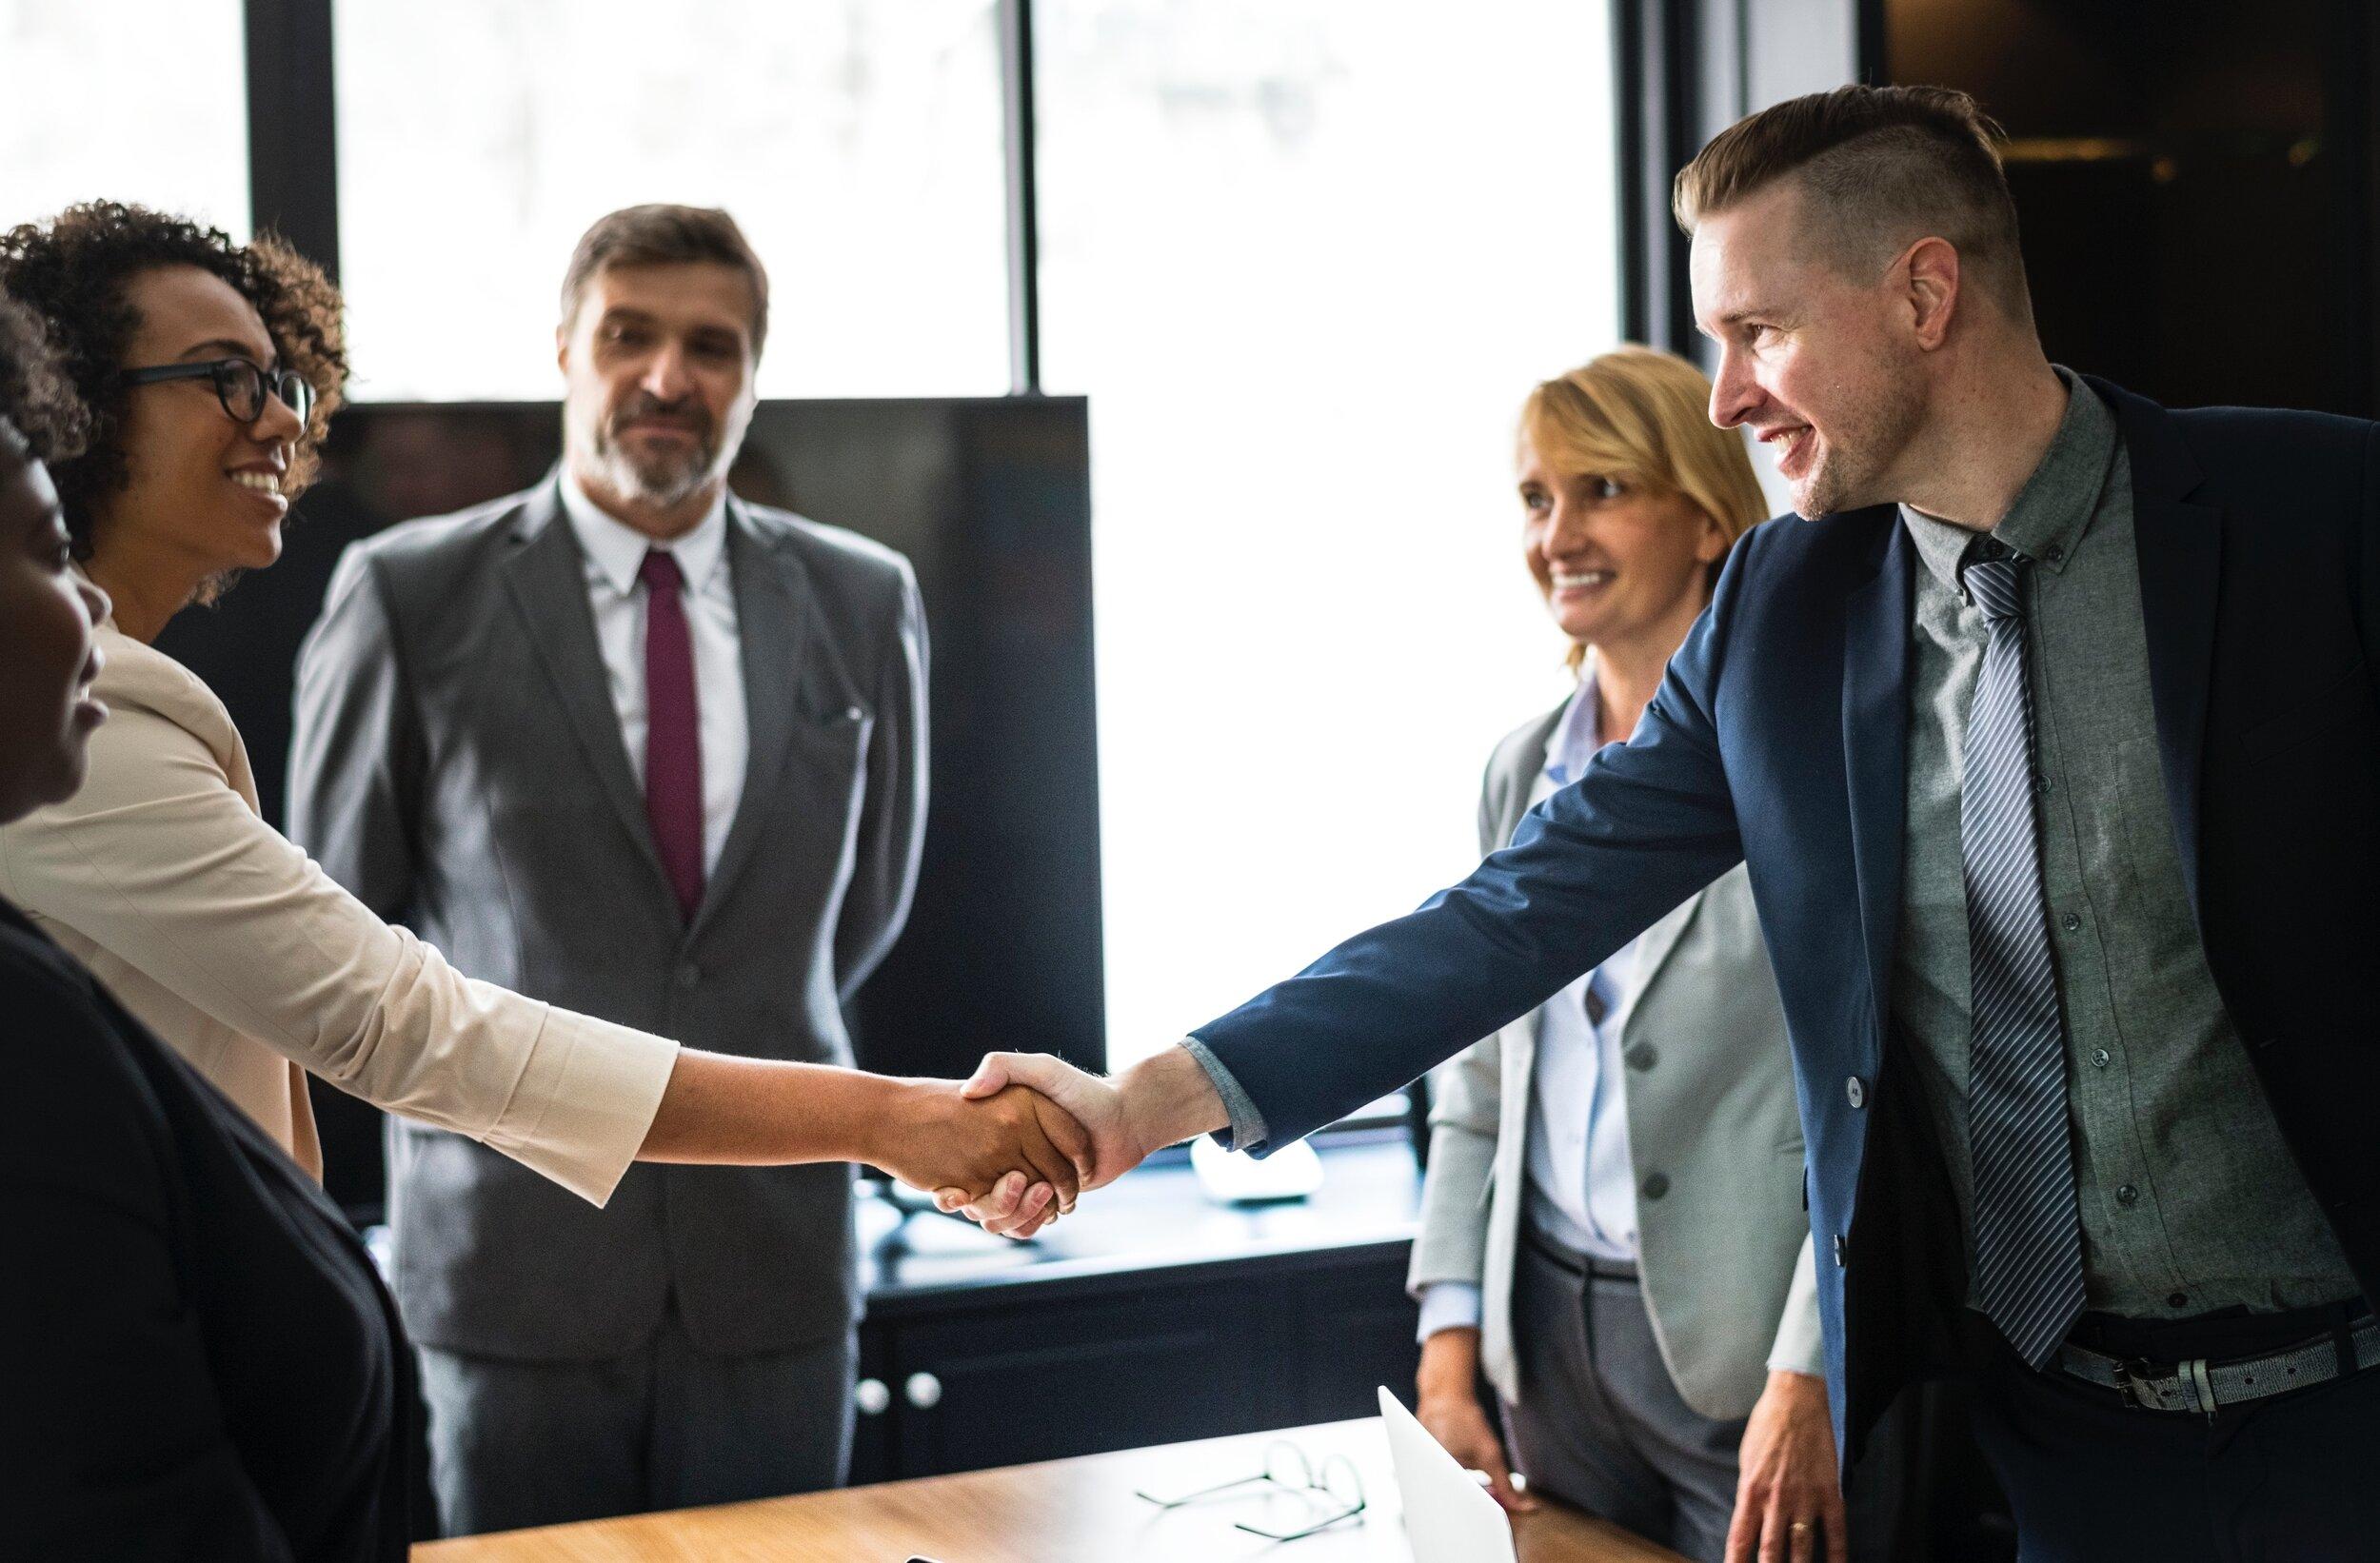 Trust translates into Better Negotiations -